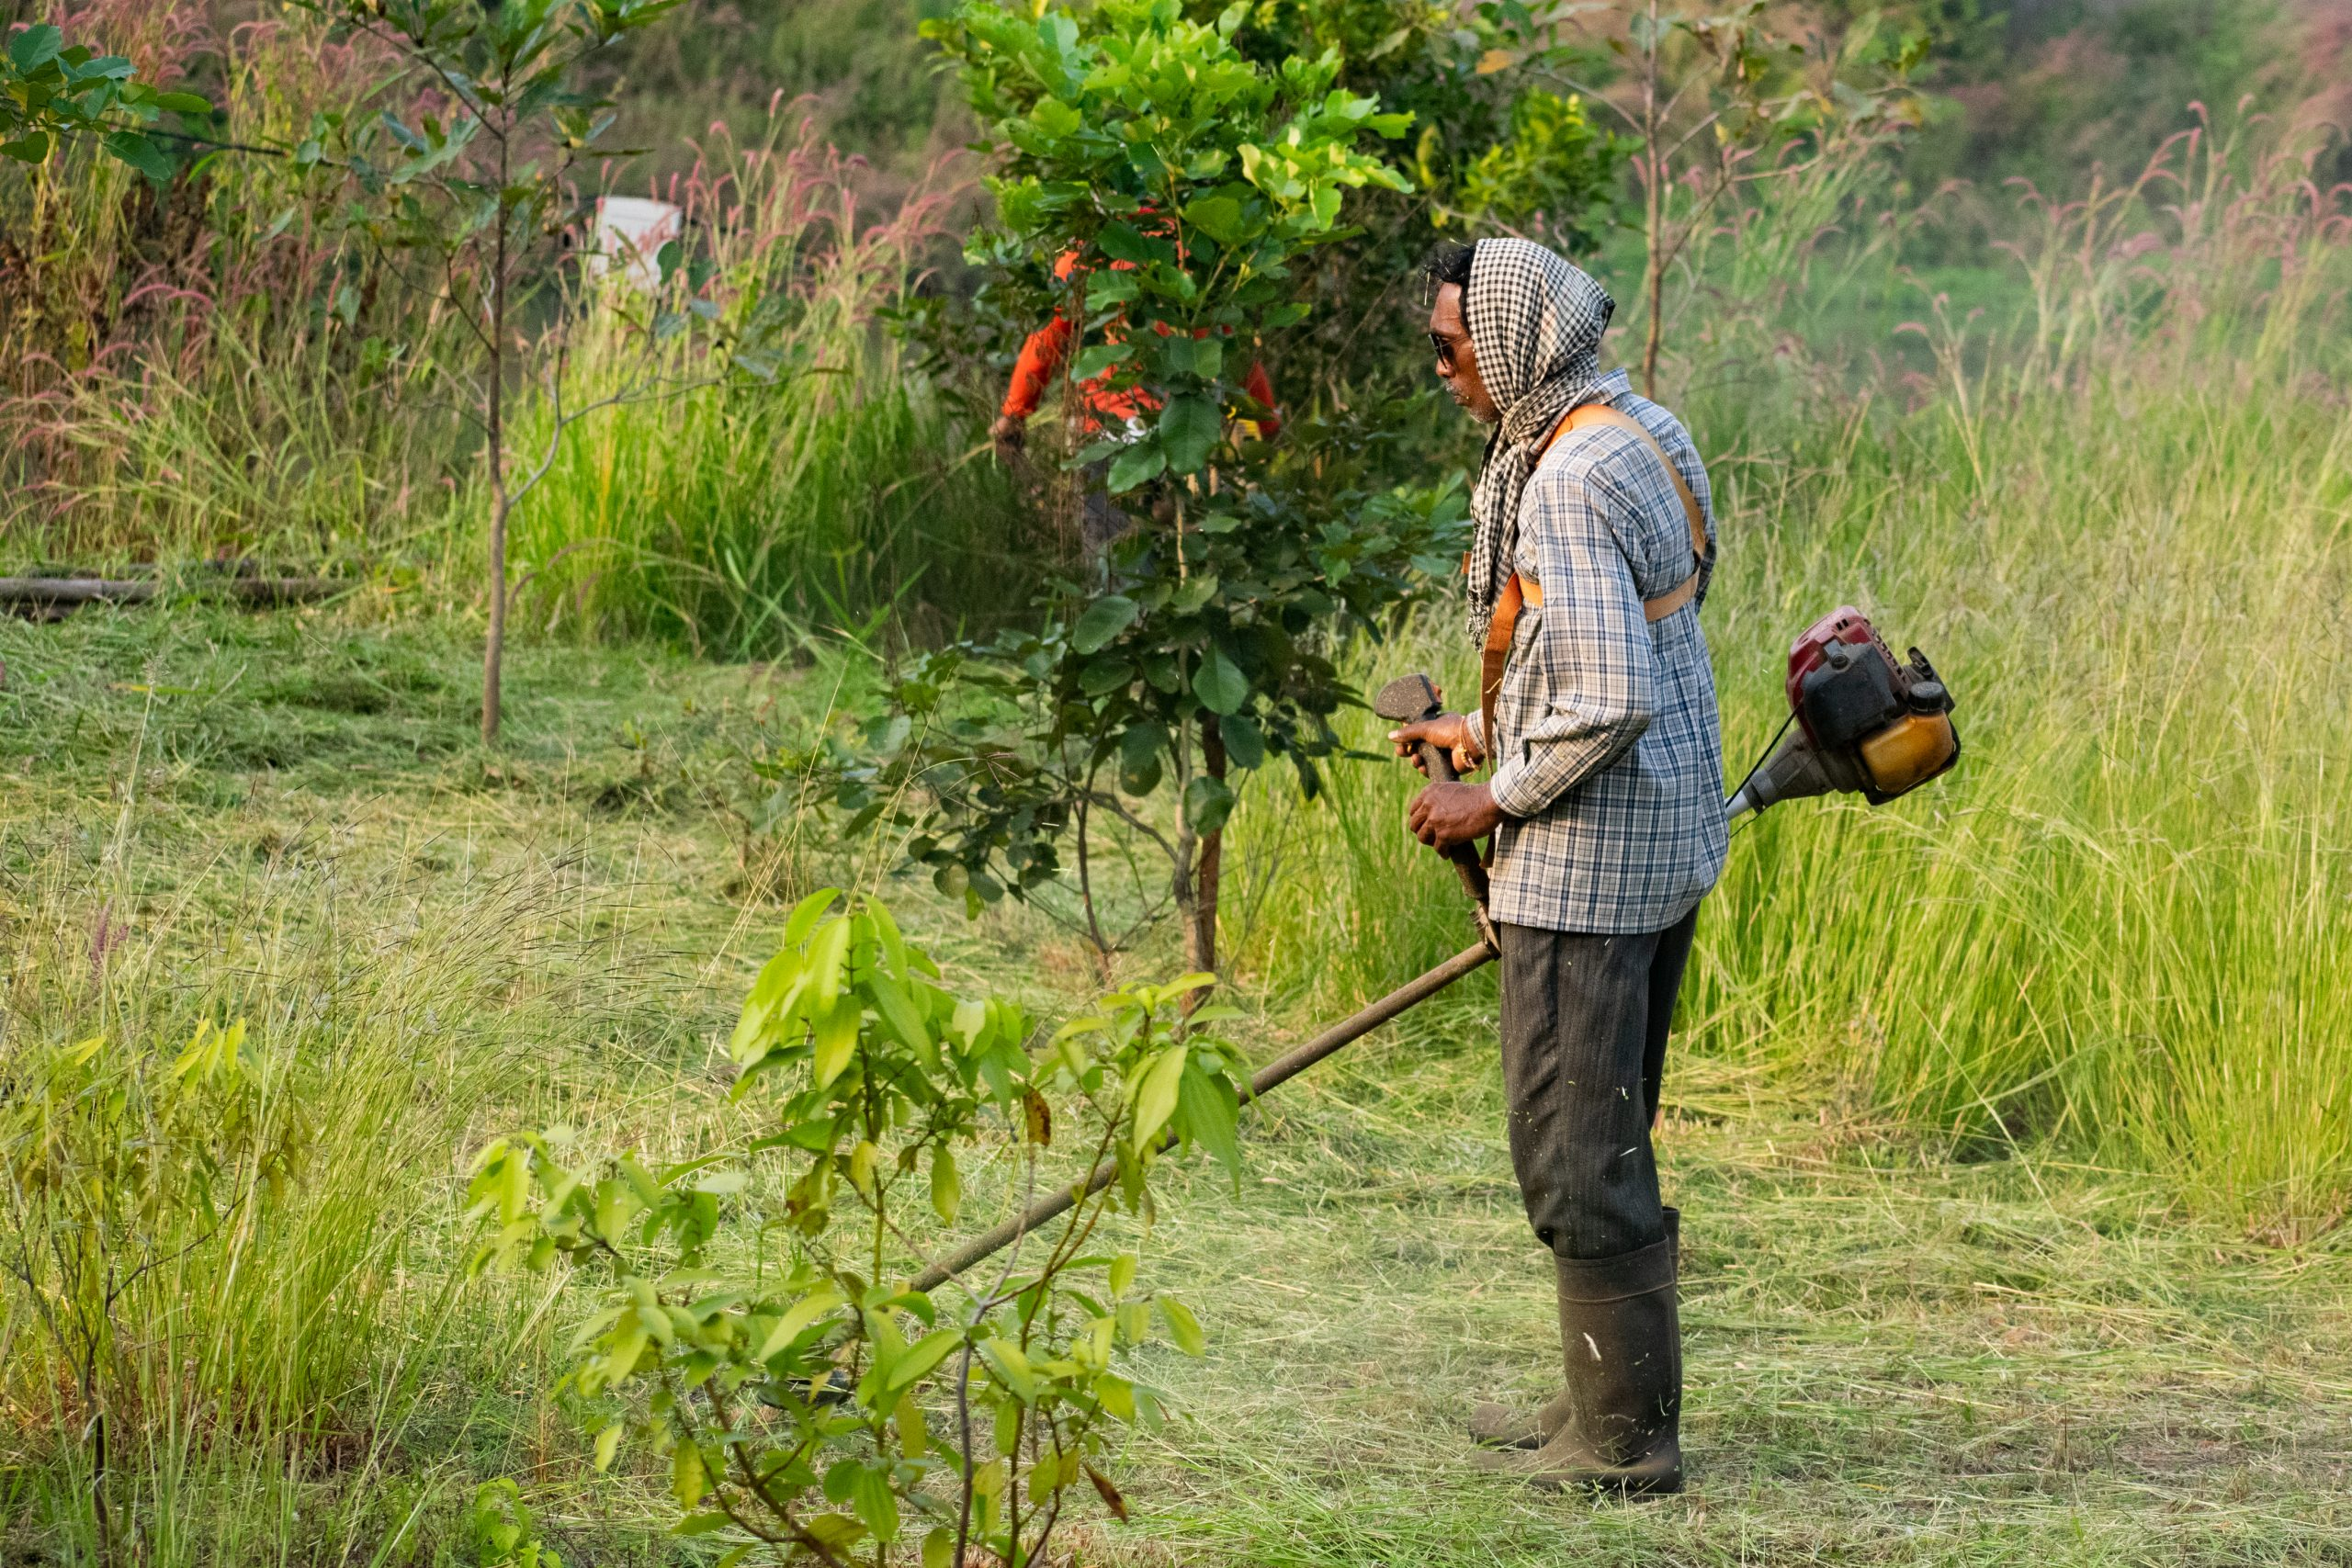 A worker cutting grass with machine